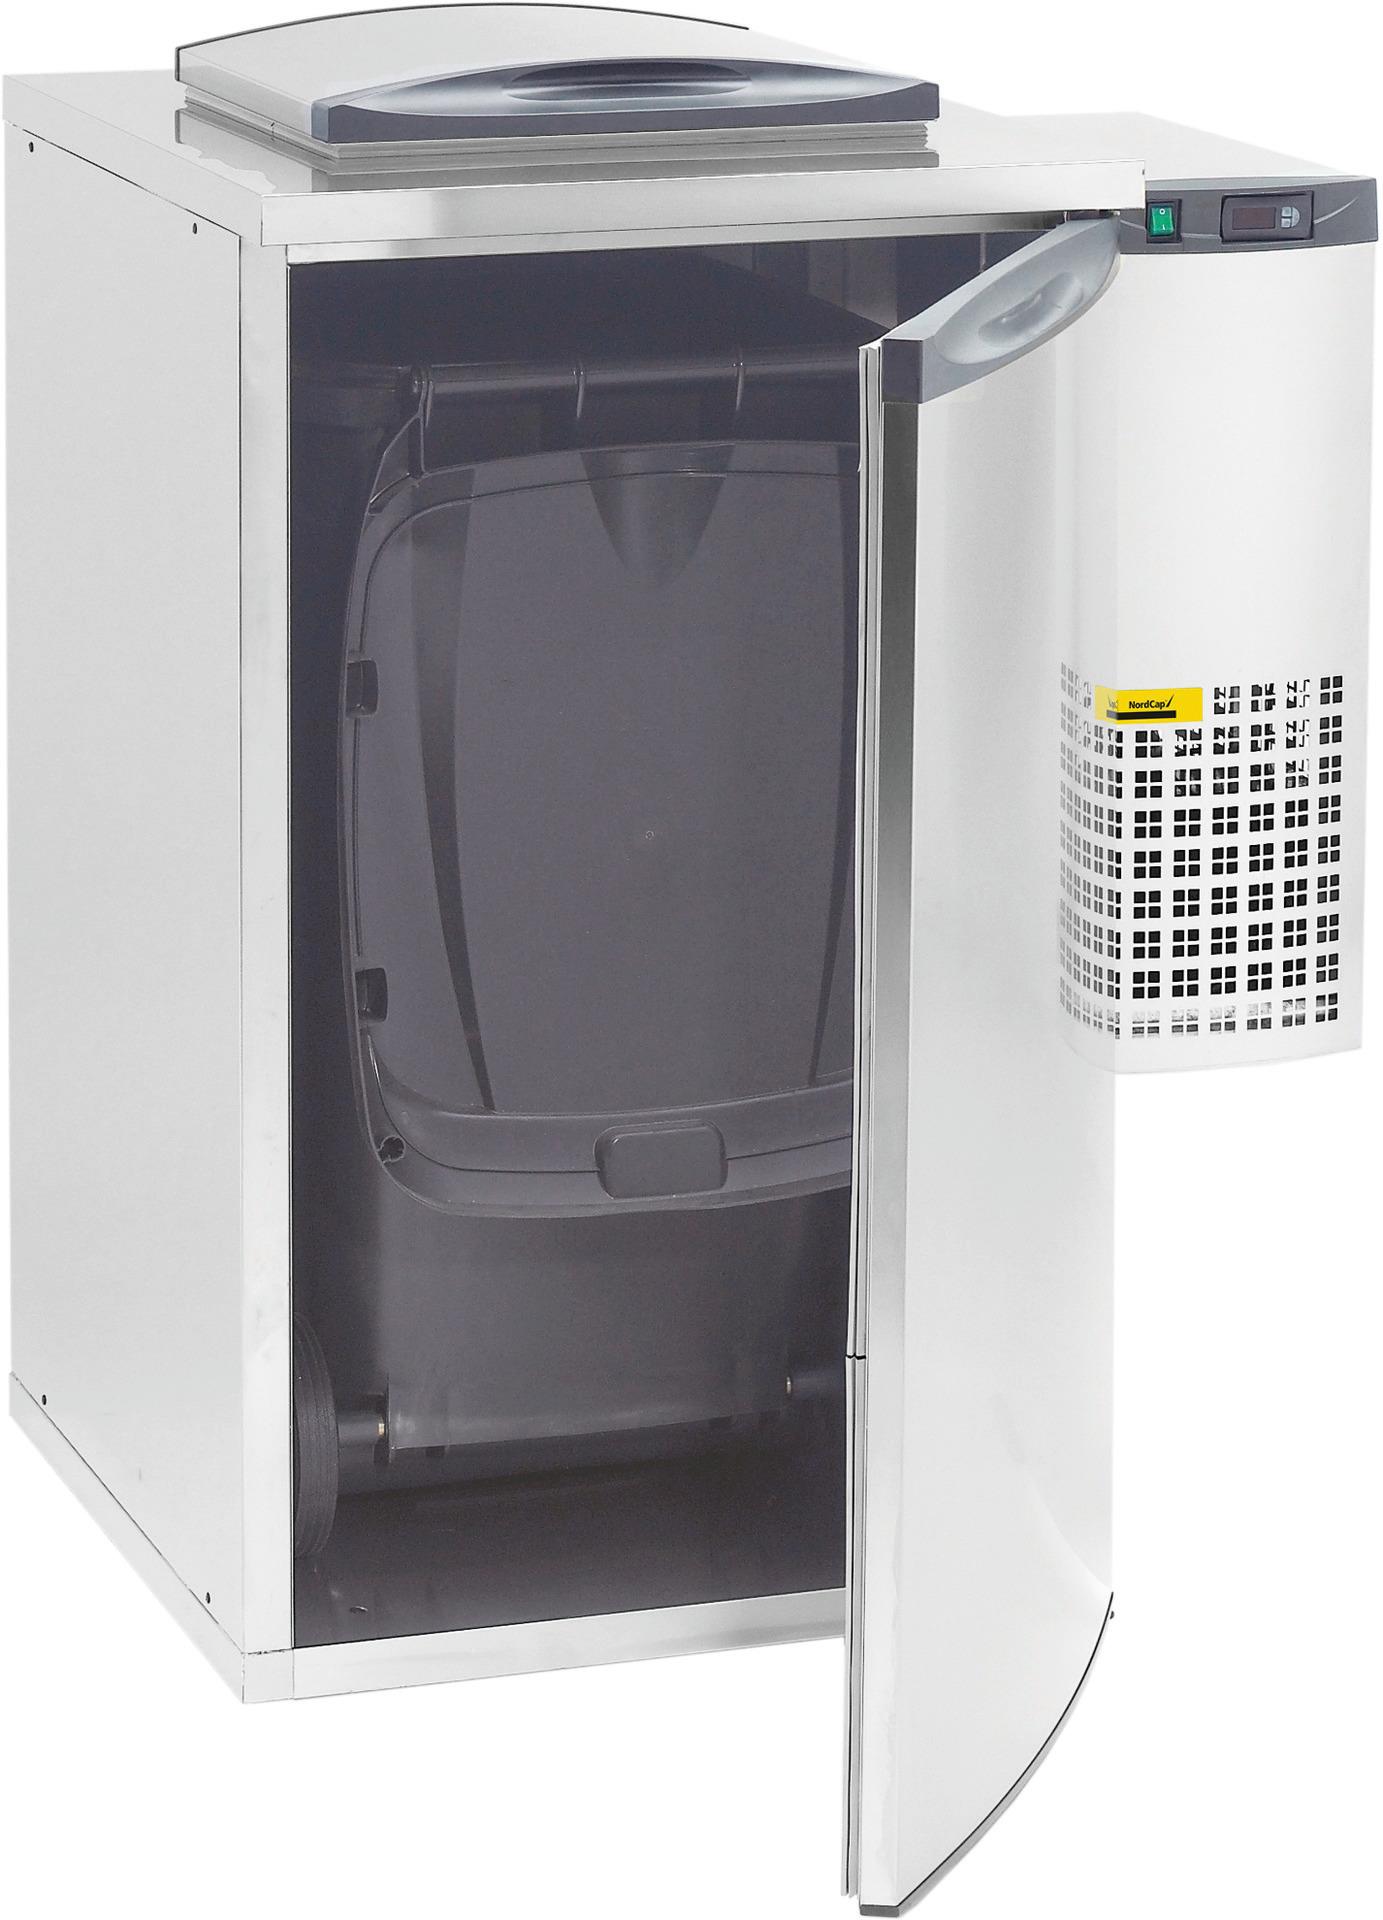 Abfall- / Konfiskatkühler für  1 x 240,00 l / steckerfertig